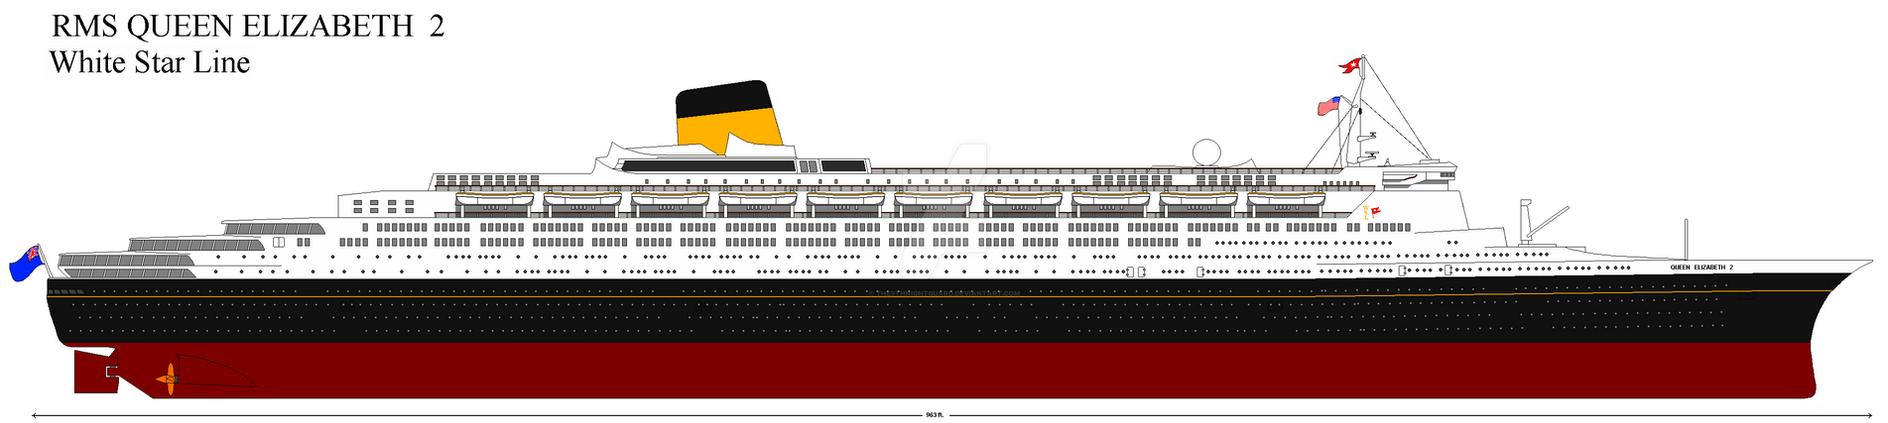 RMS Queen Elizabeth 2 AU by p51cmustang